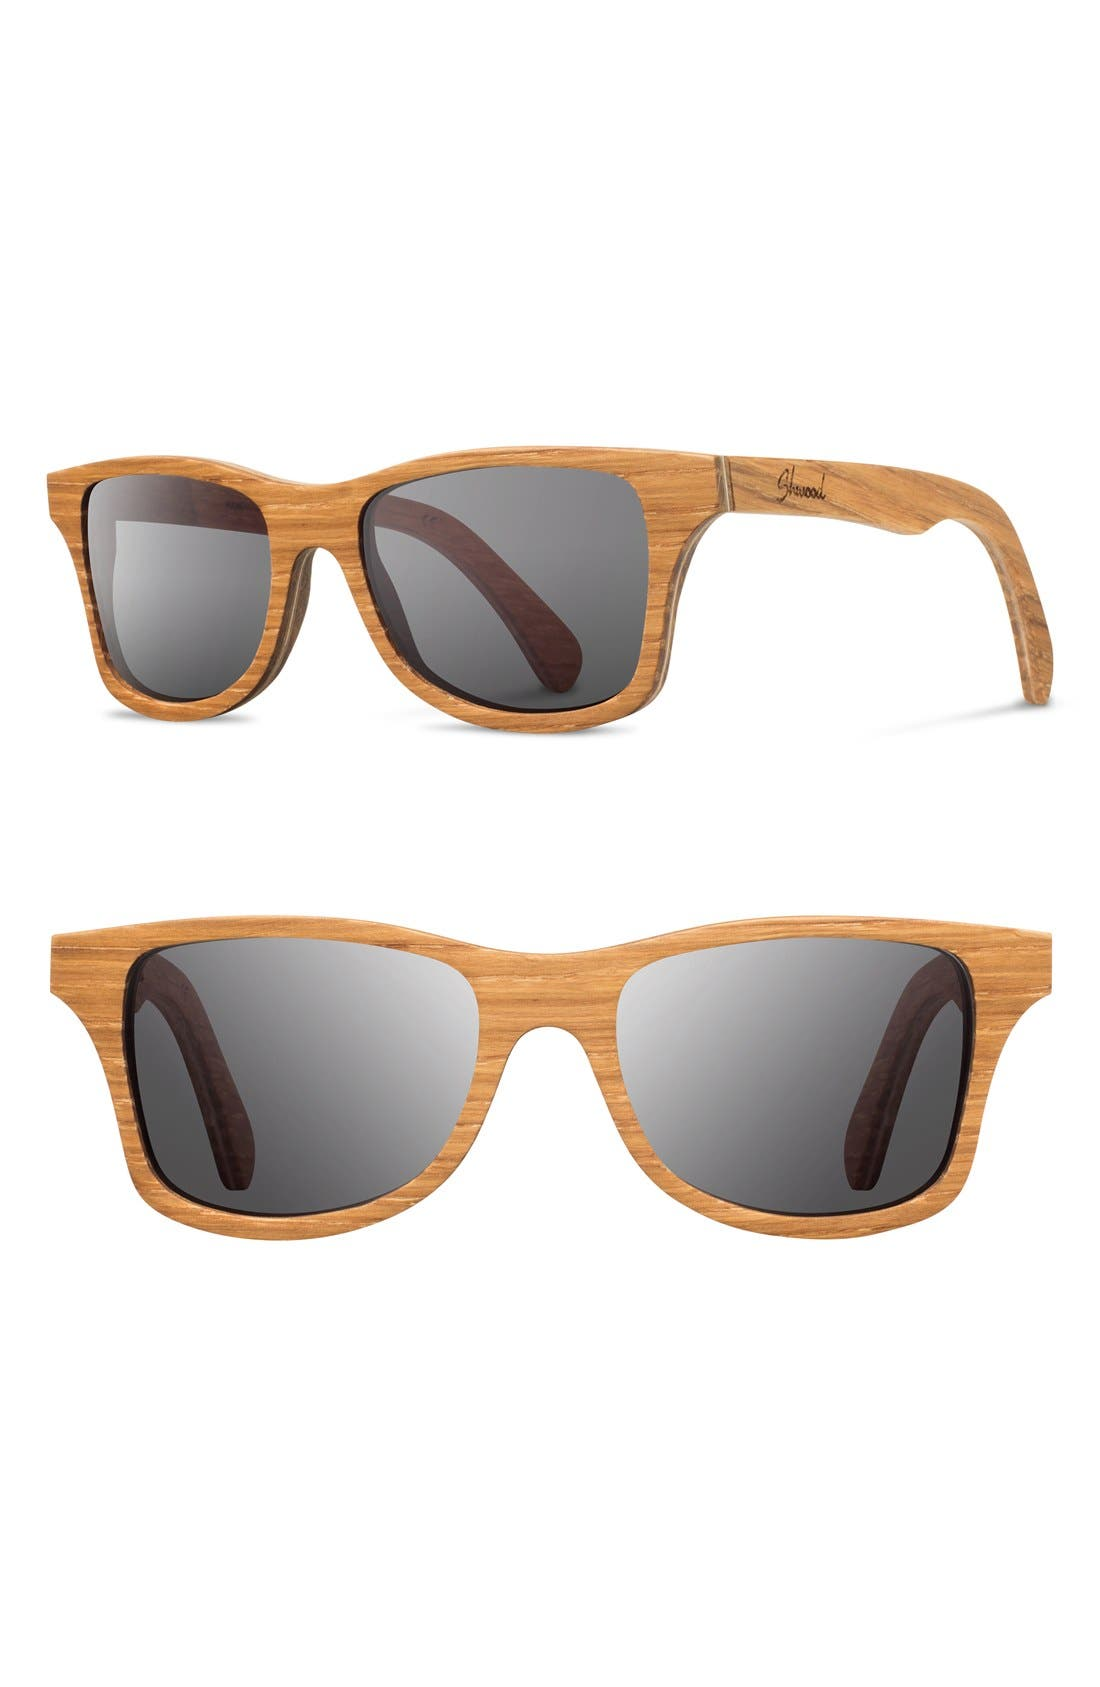 Alternate Image 1 Selected - Shwood 'Canby' 54mm Polarized Wood Sunglasses